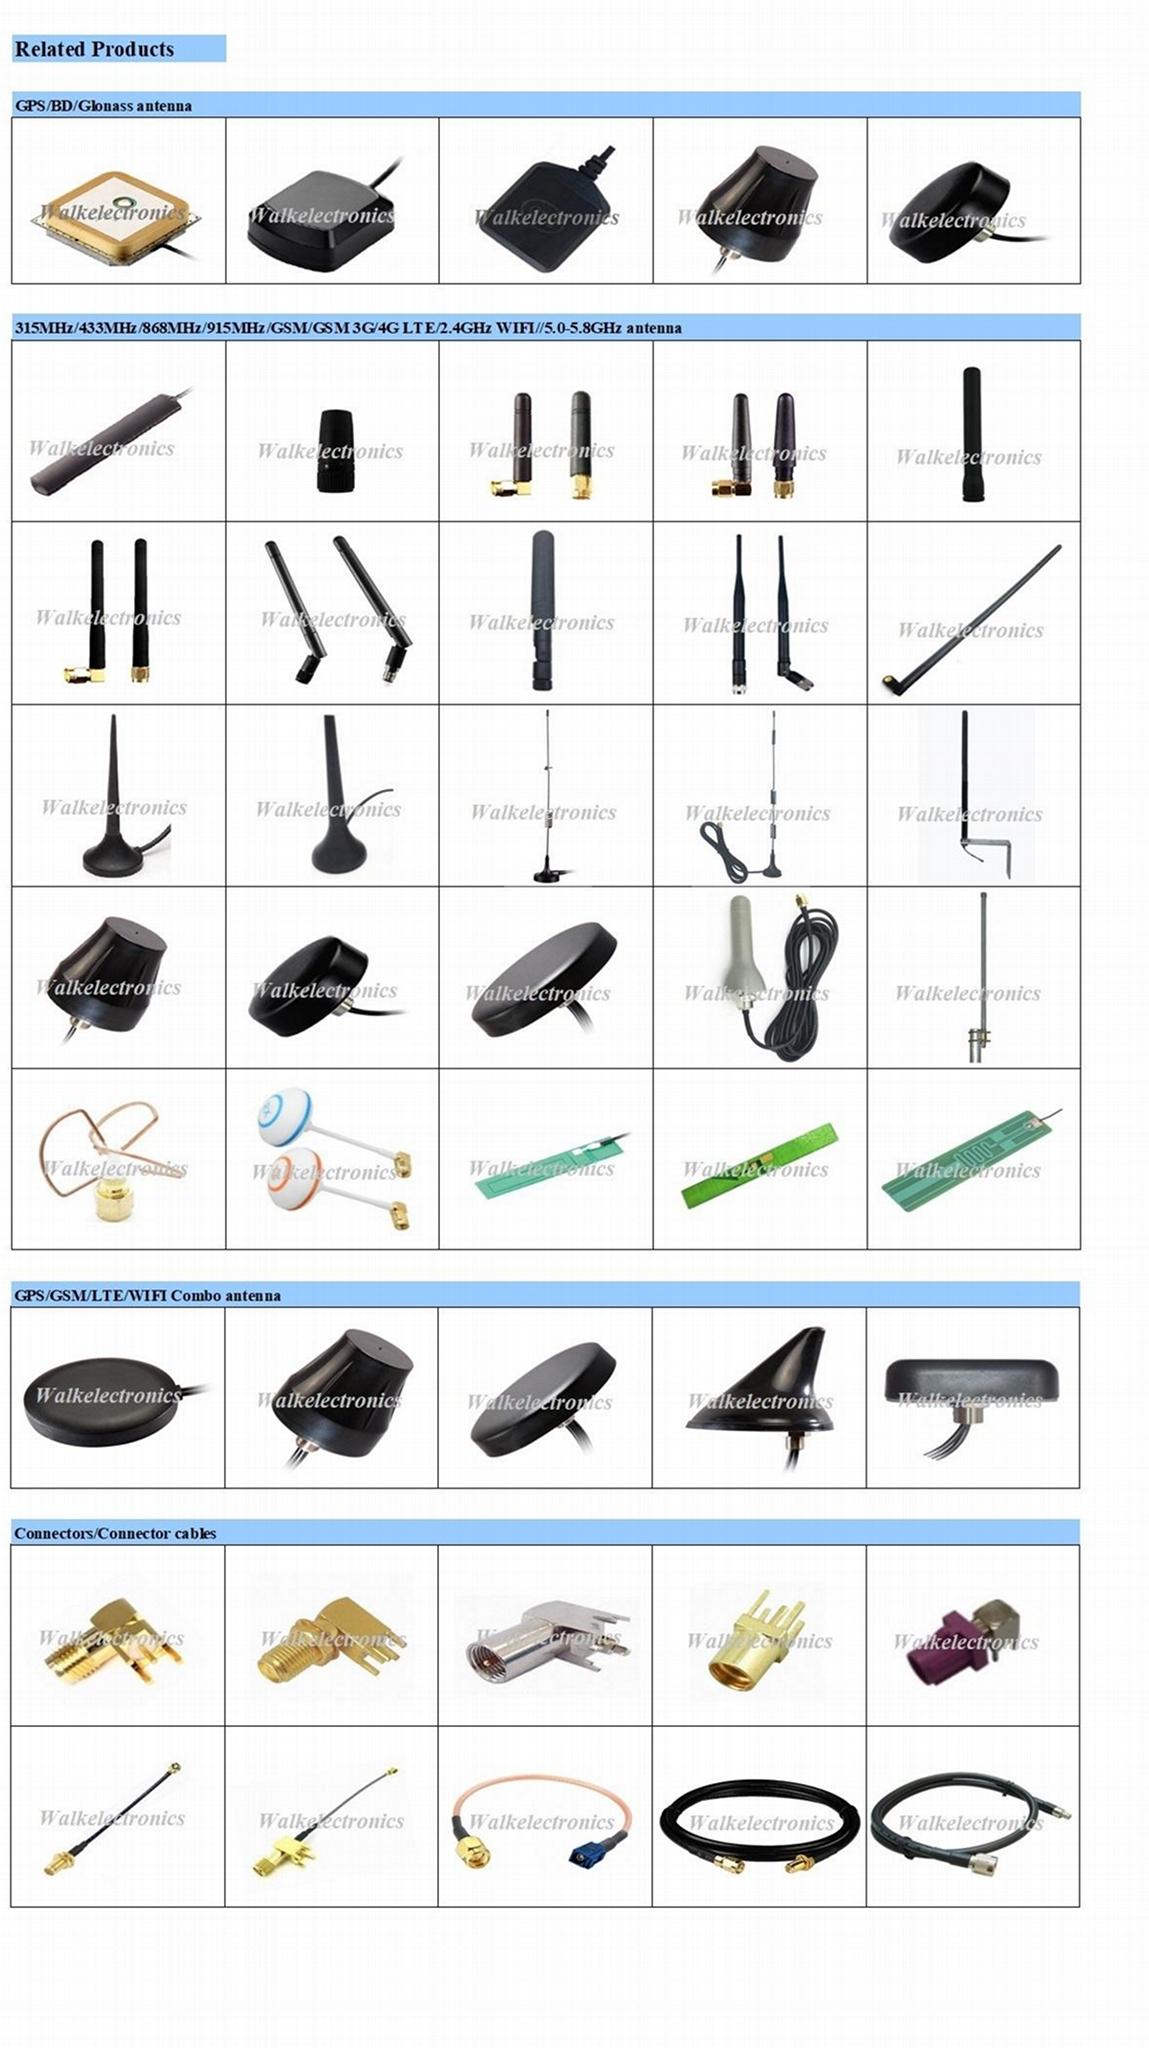 600-6000MHz wide range 2g 3g 4g 5g multi band flexible SMA male stubby antenna 3